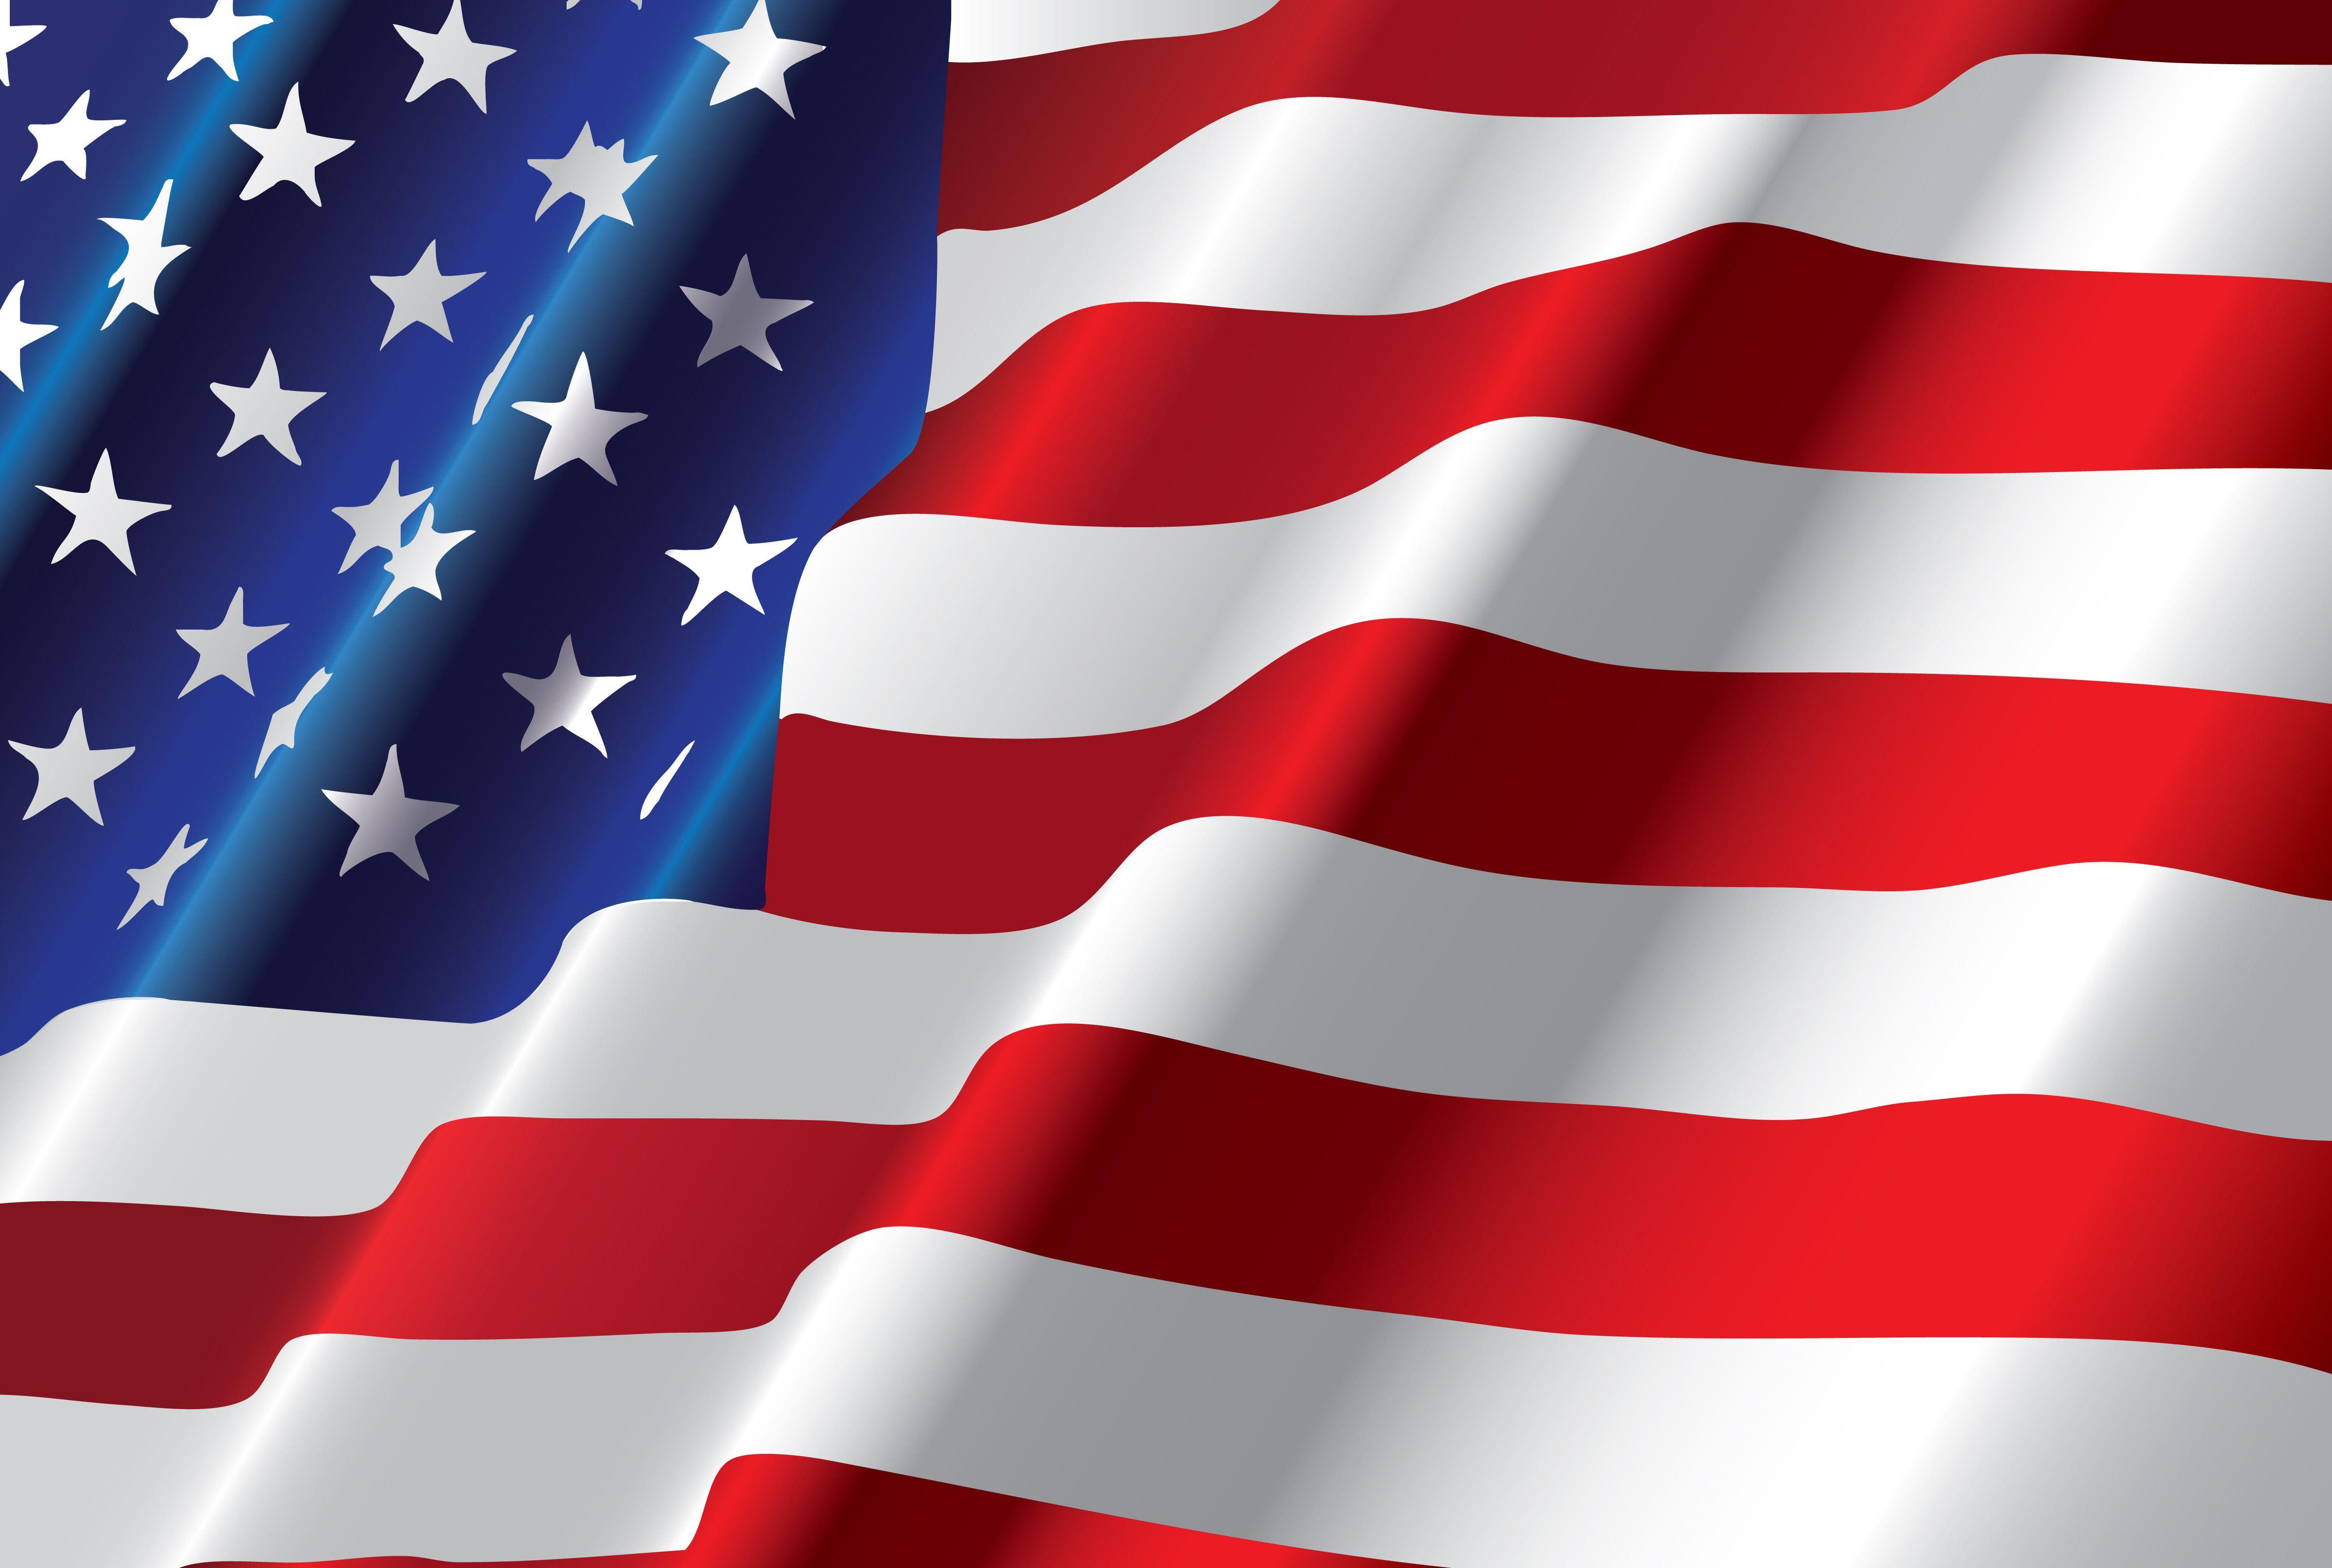 United States Flag Backgrounds 4722x3176